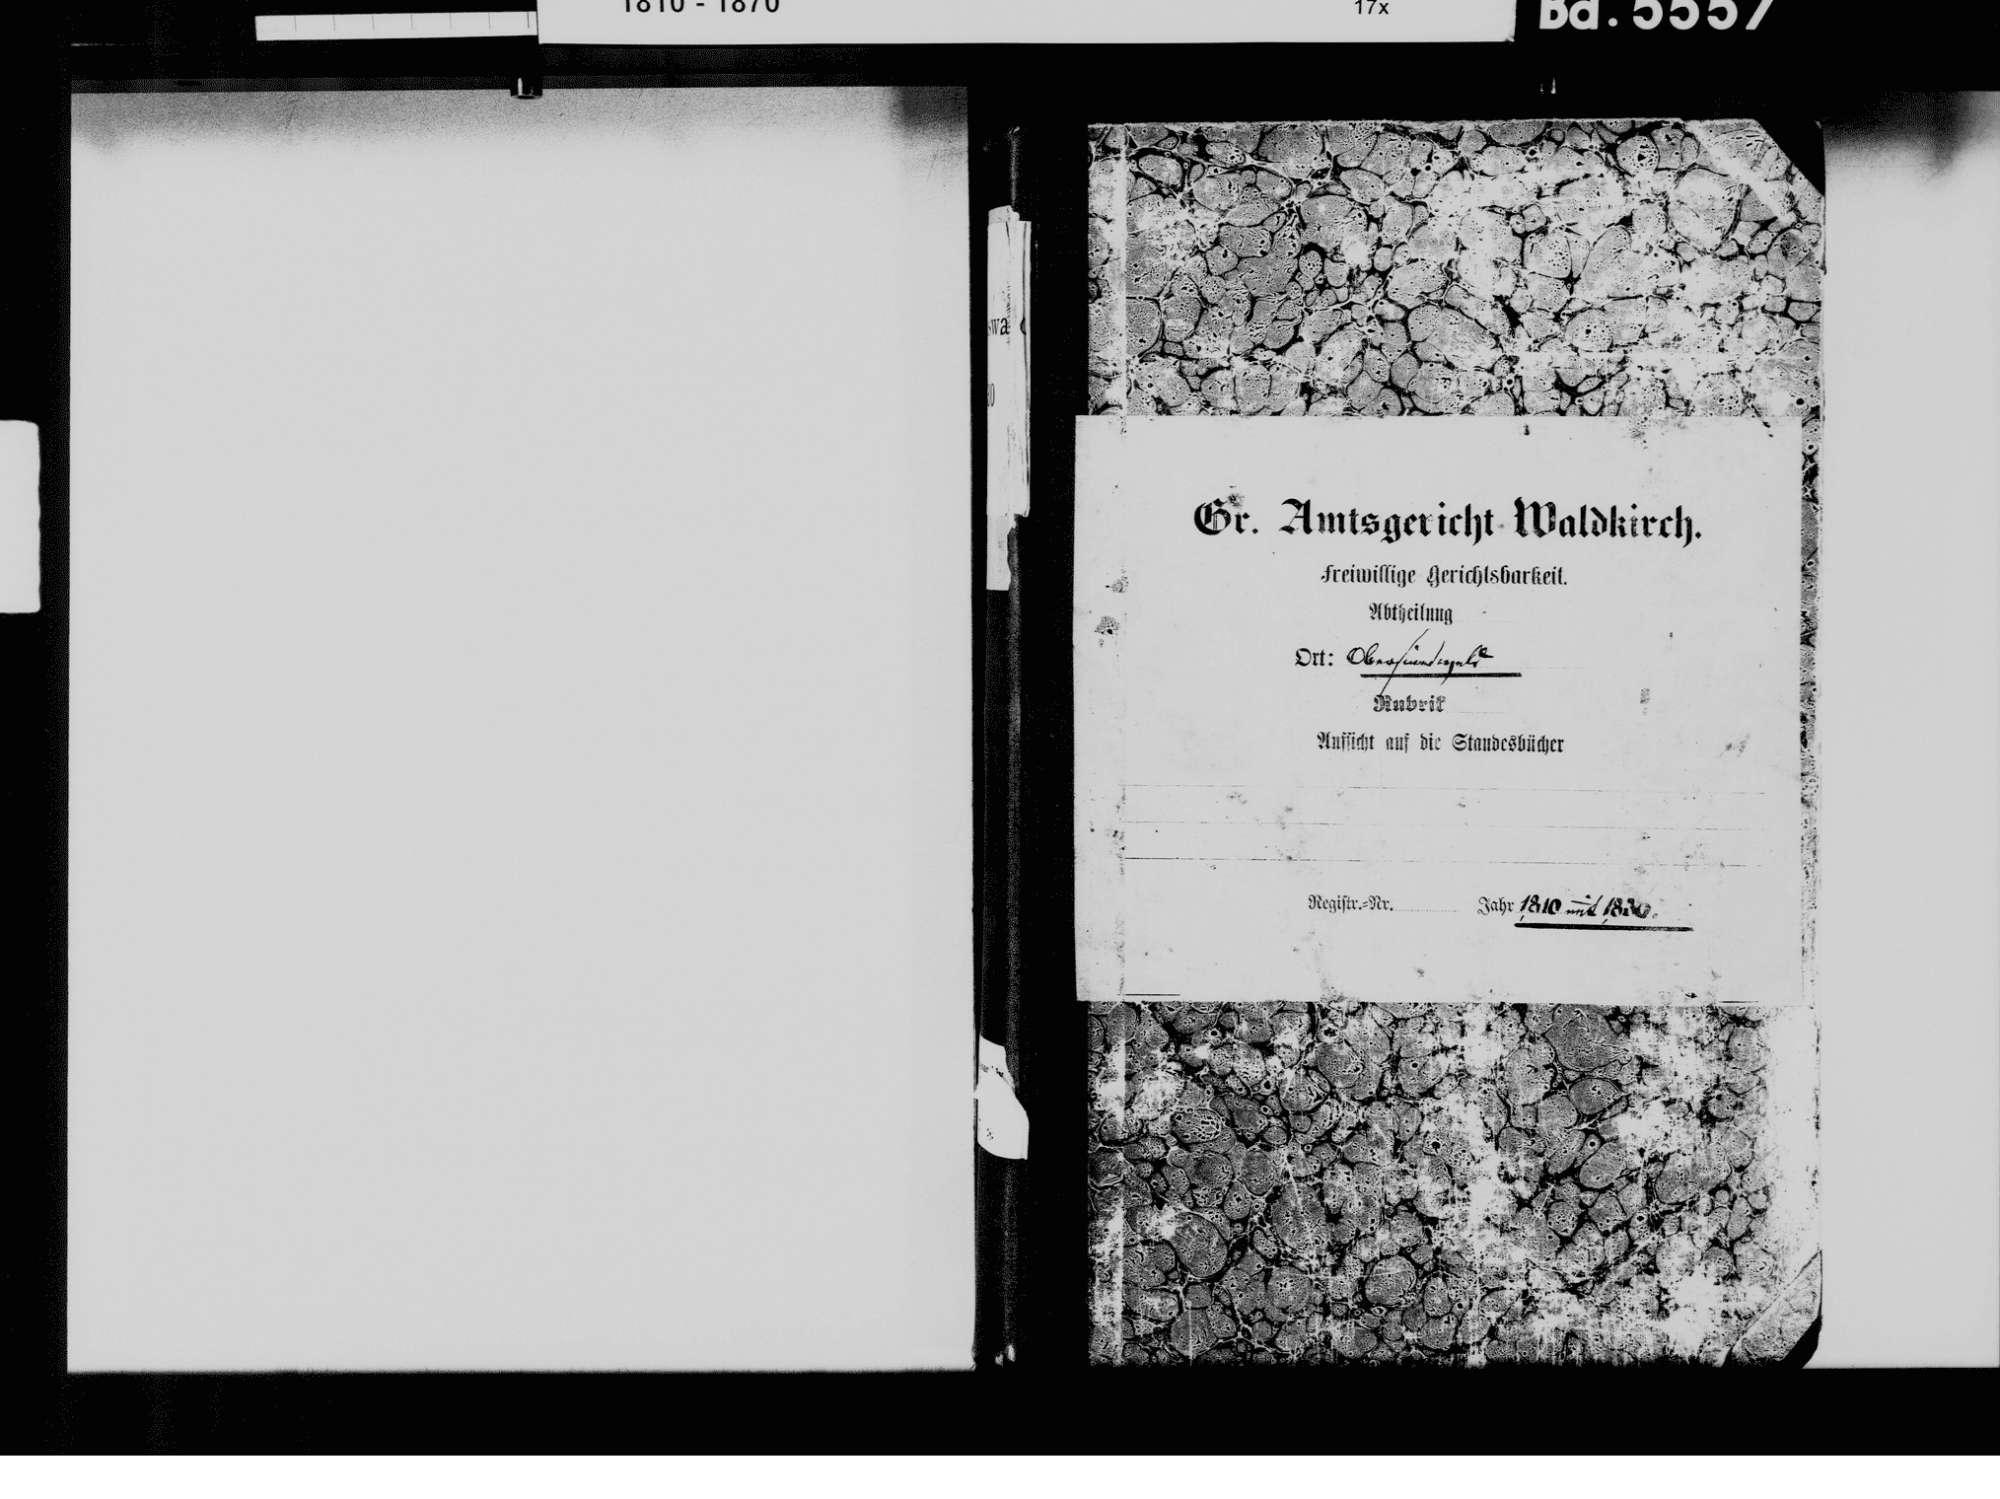 Obersimonswald, Simonswald EM; Katholische Gemeinde: Pfarrei St. Peter, Standesbuch 1810-1830, Bild 3